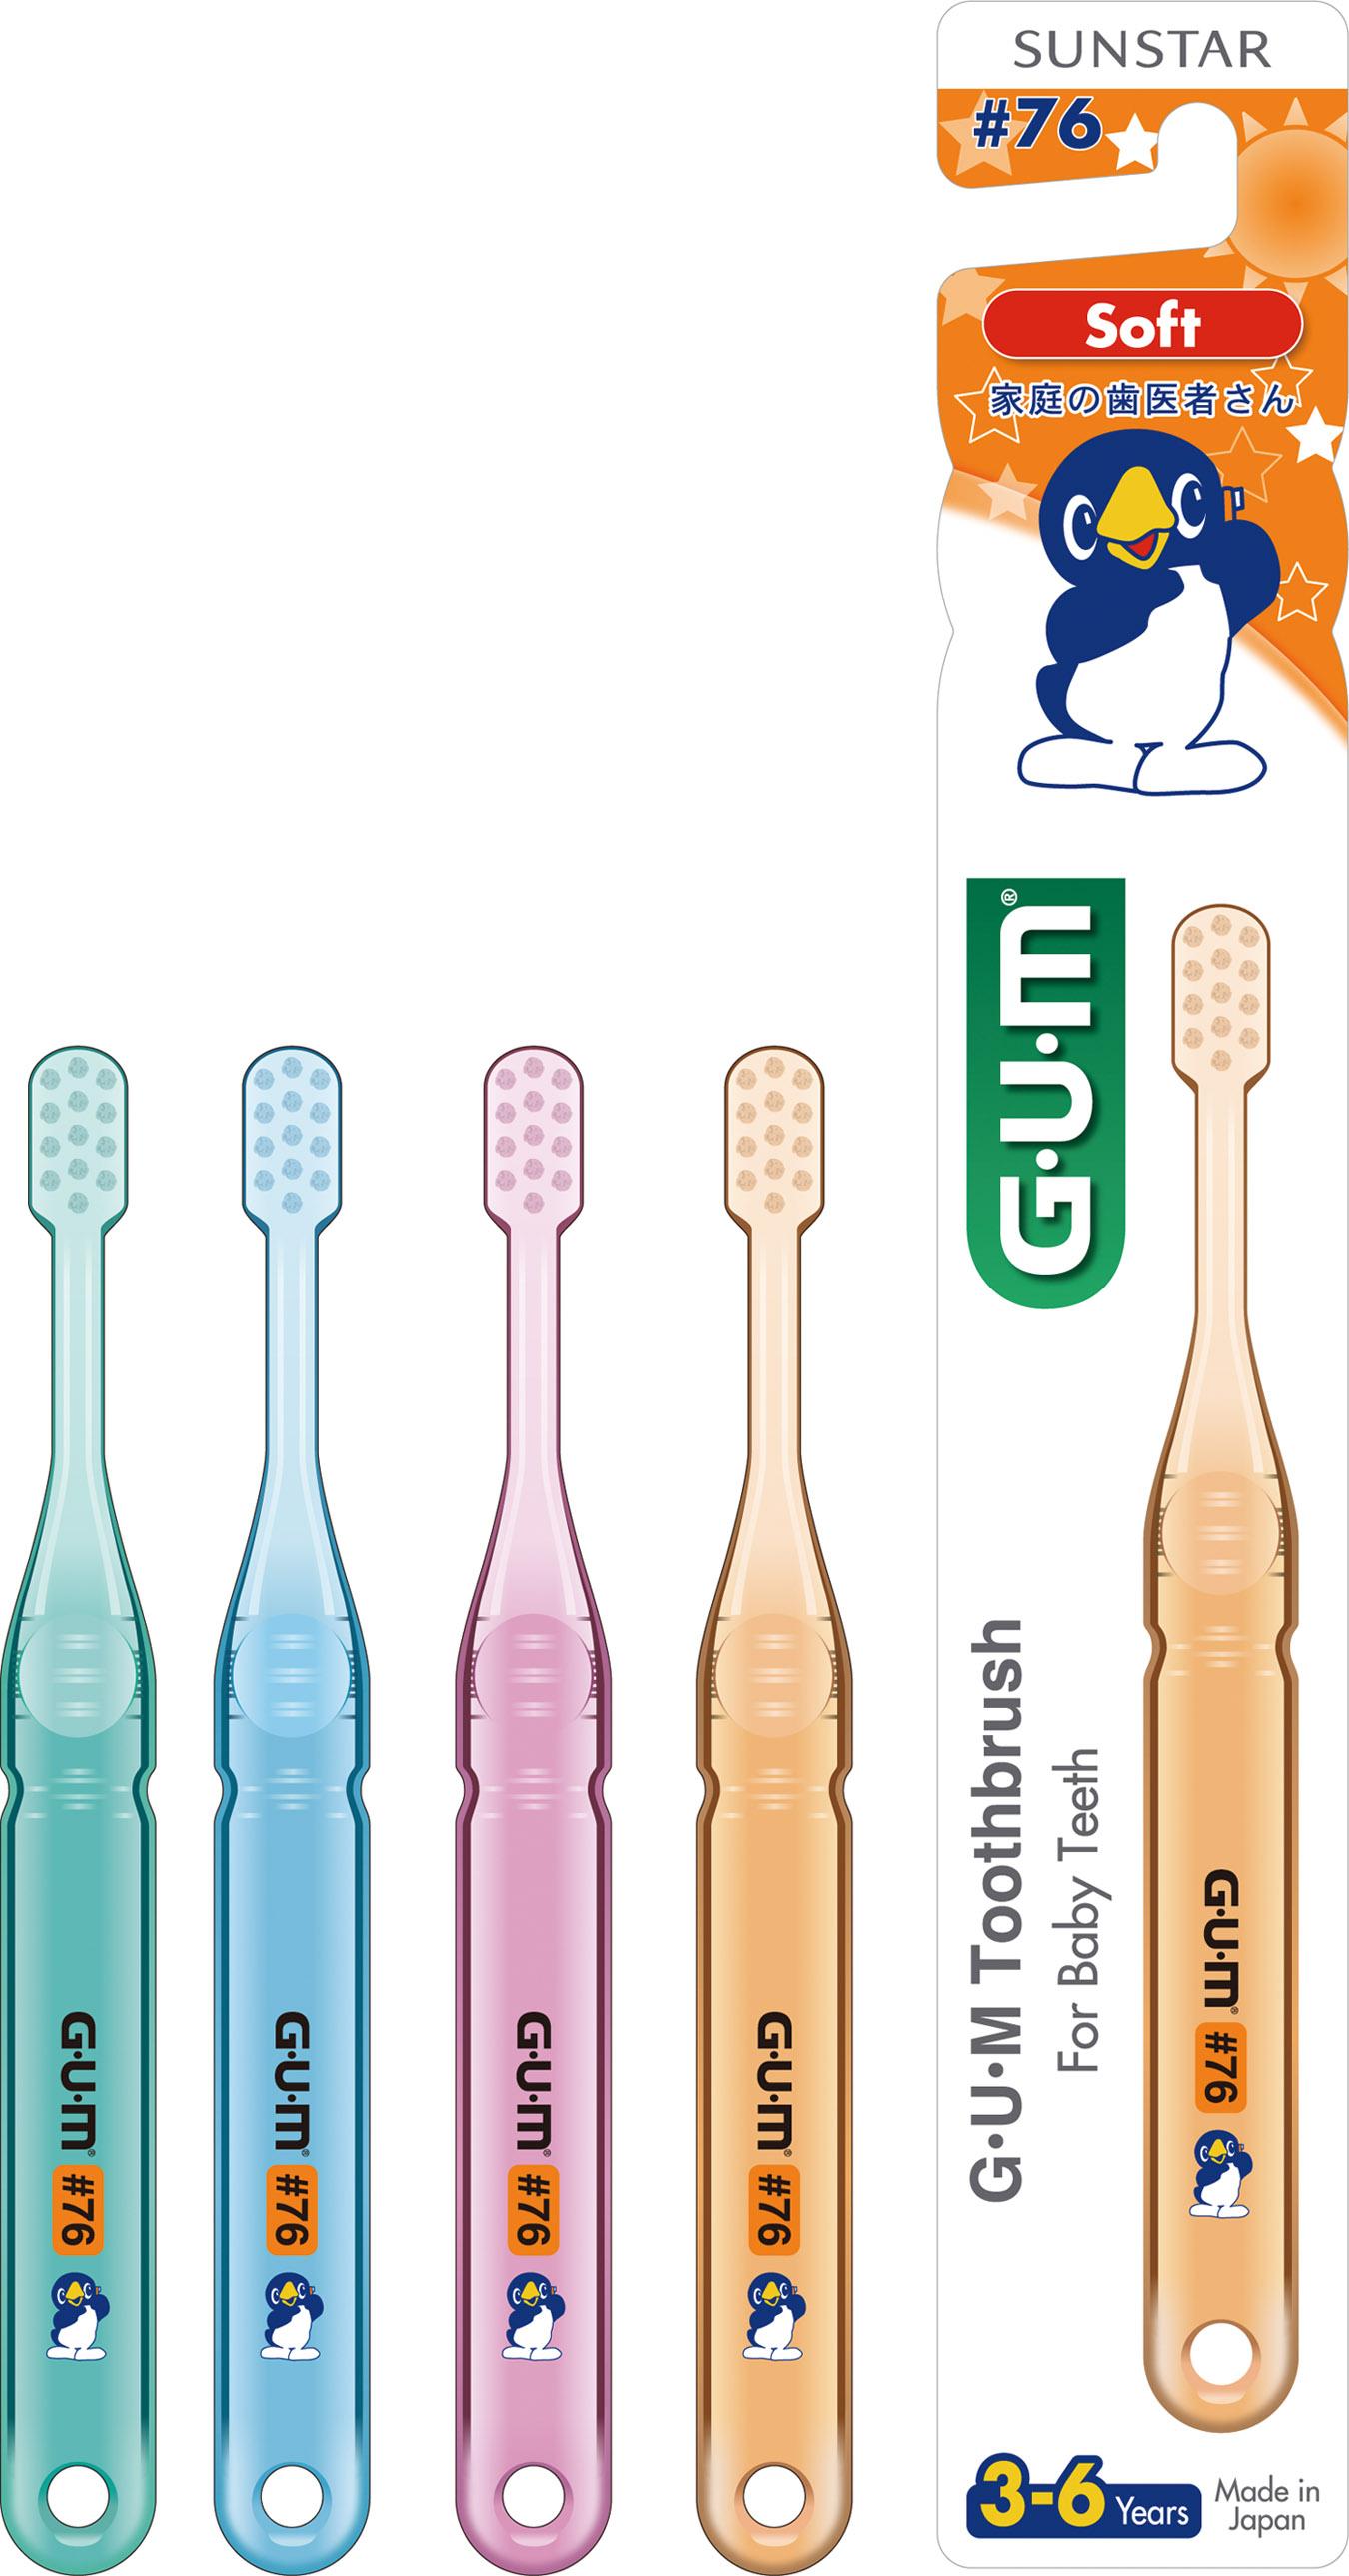 GUM Kids Toothbrush #76 for 3-6 years